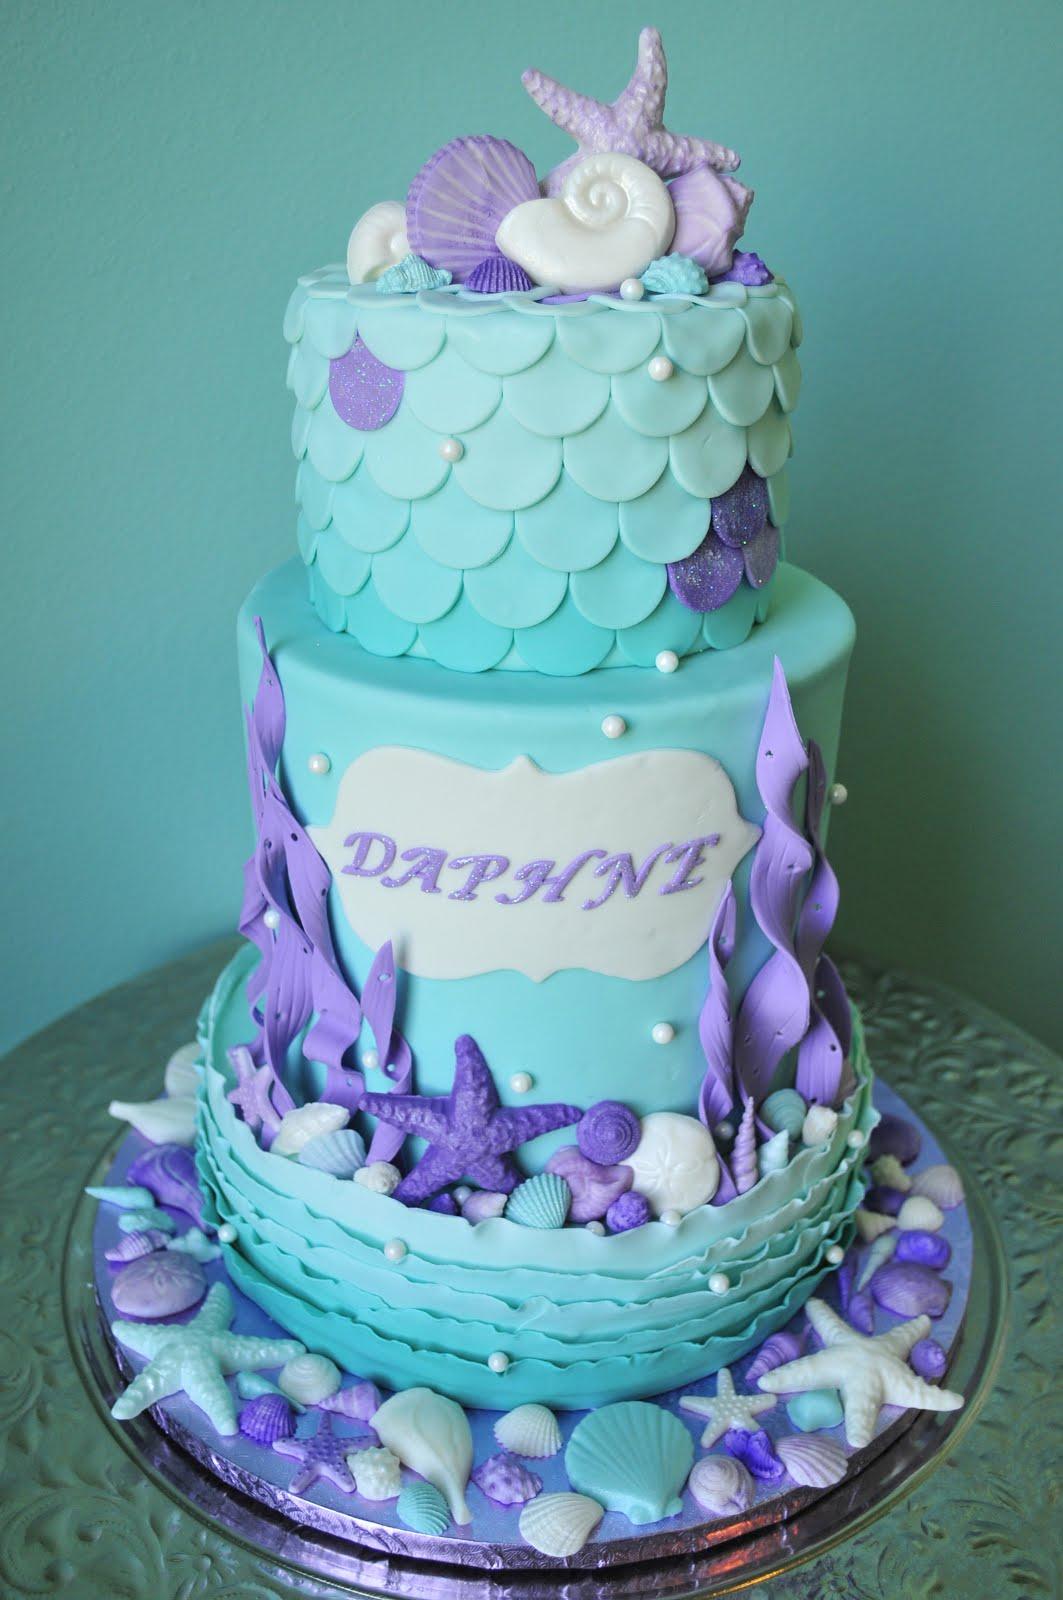 Lindsays Custom Cakes